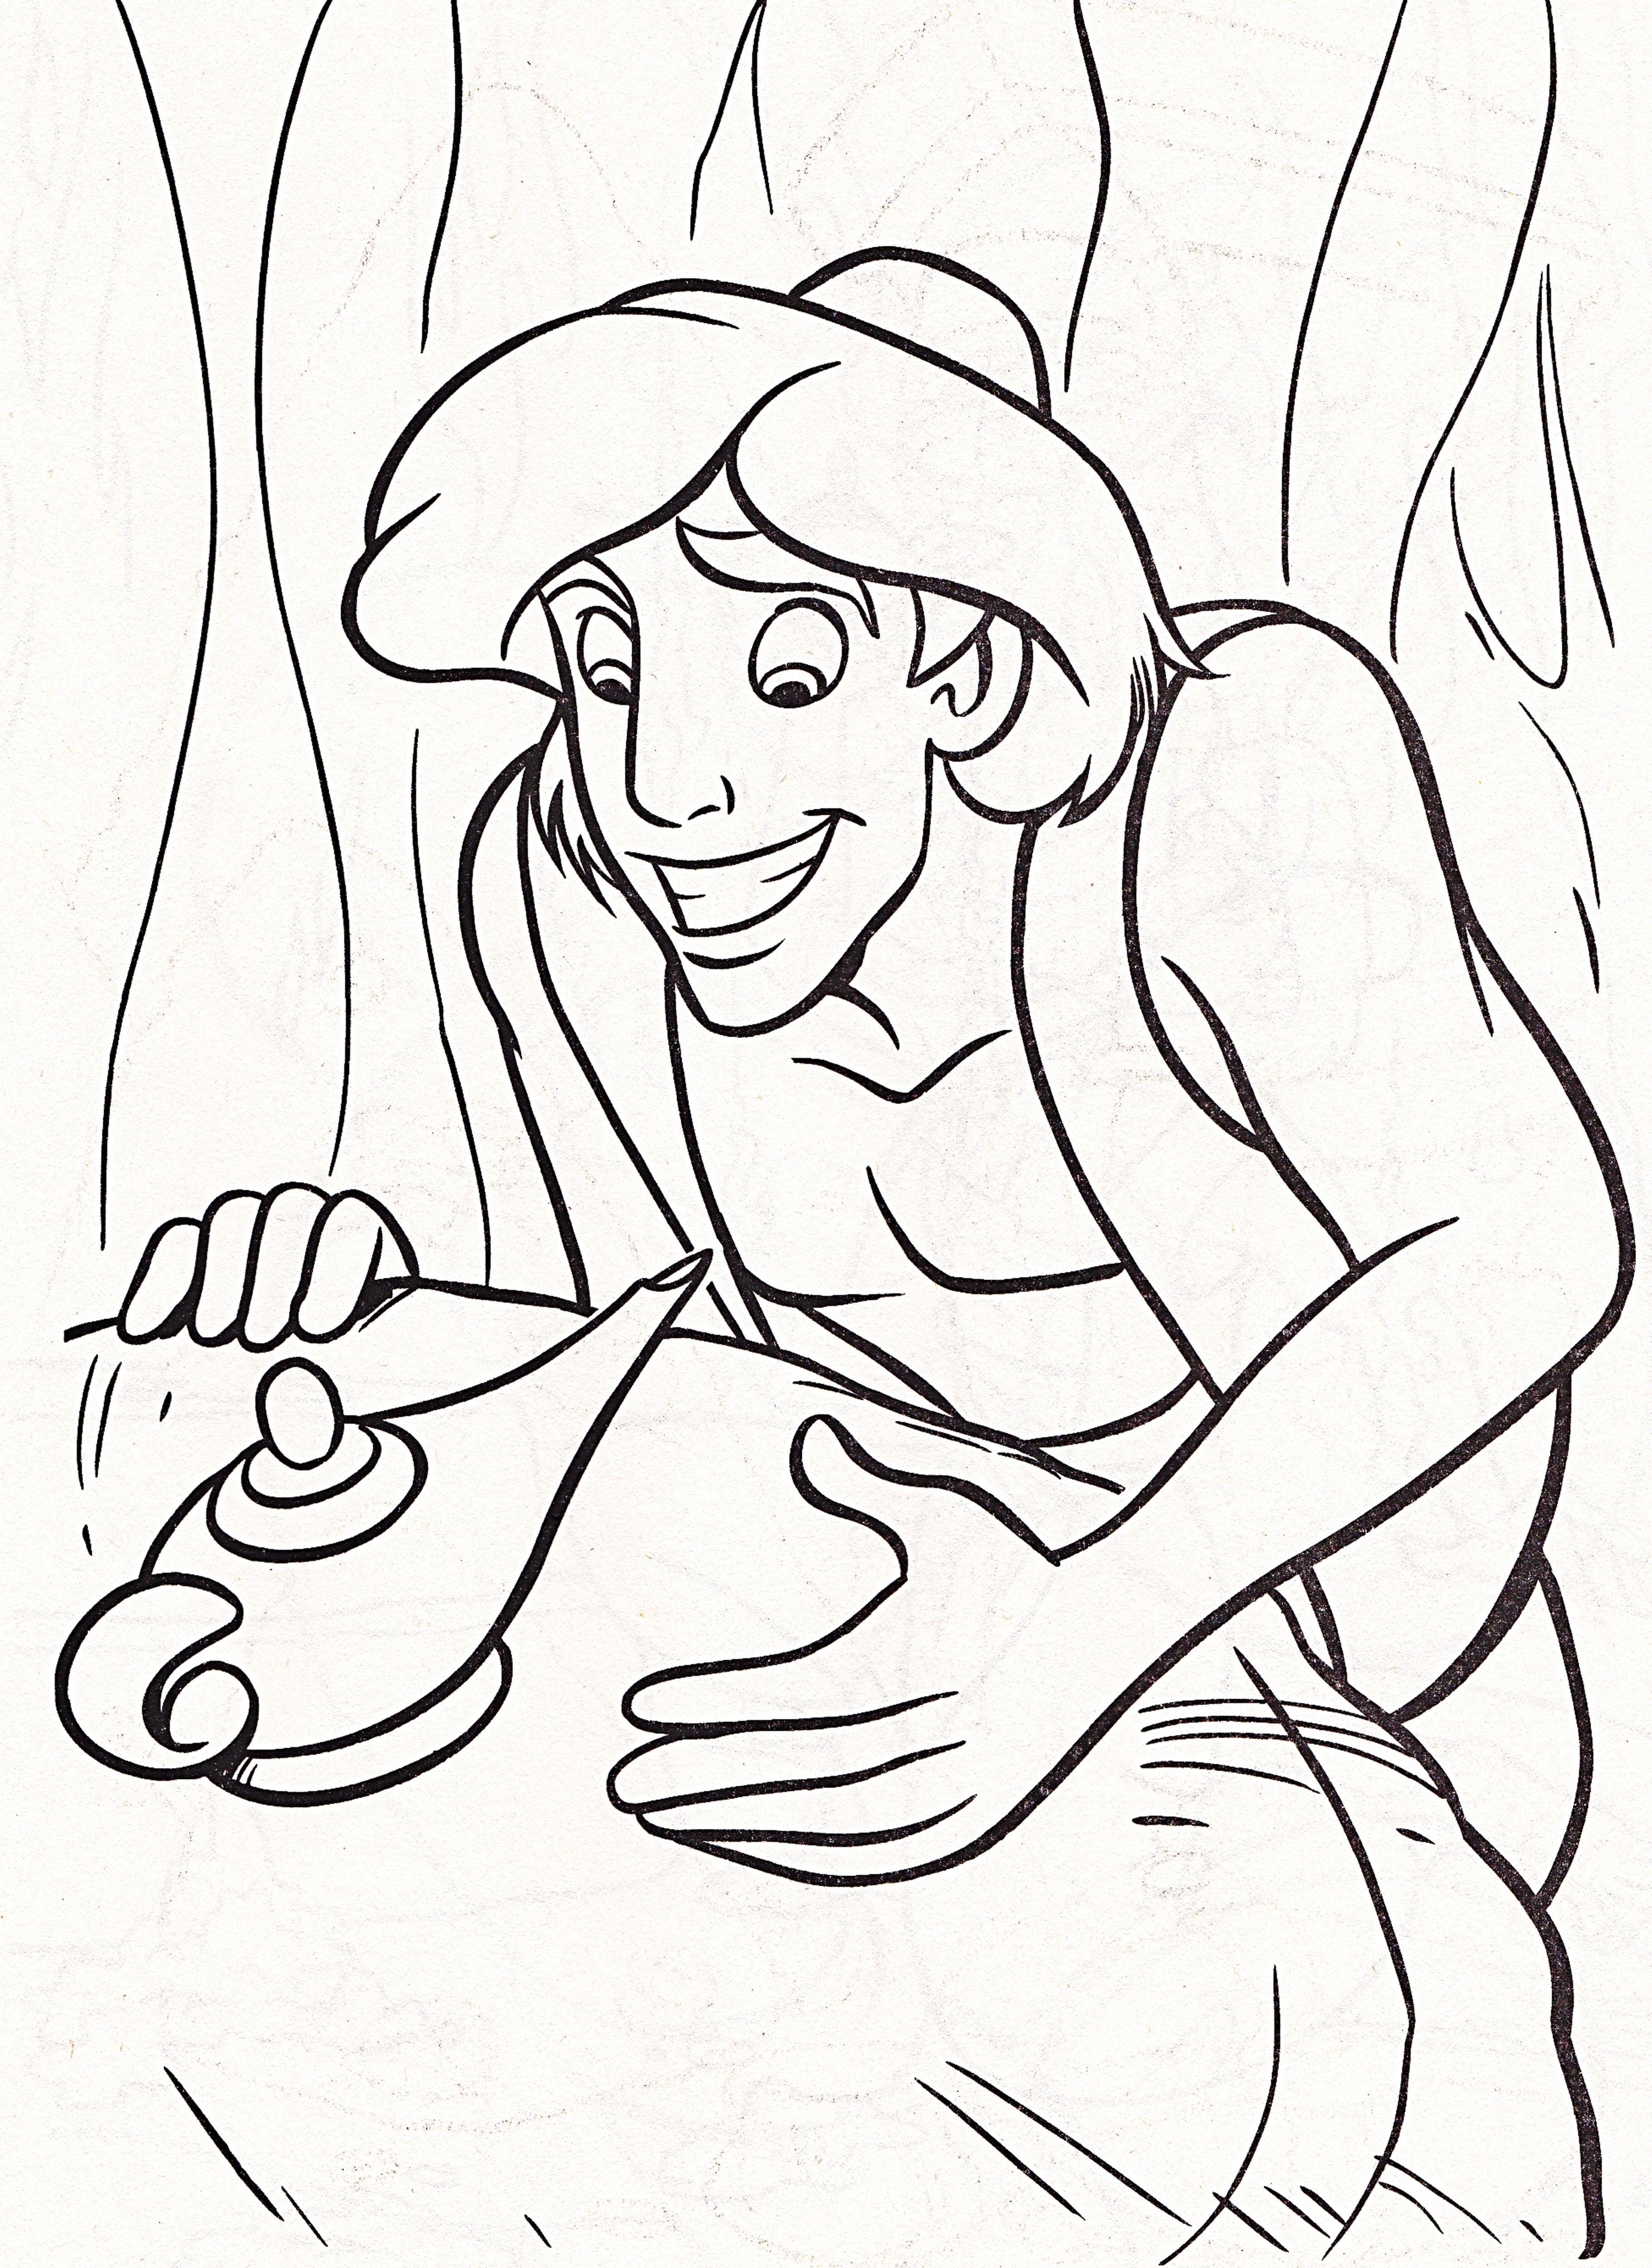 Walt Disney Coloring Pages - Prince Aladdin  Dessin jasmine